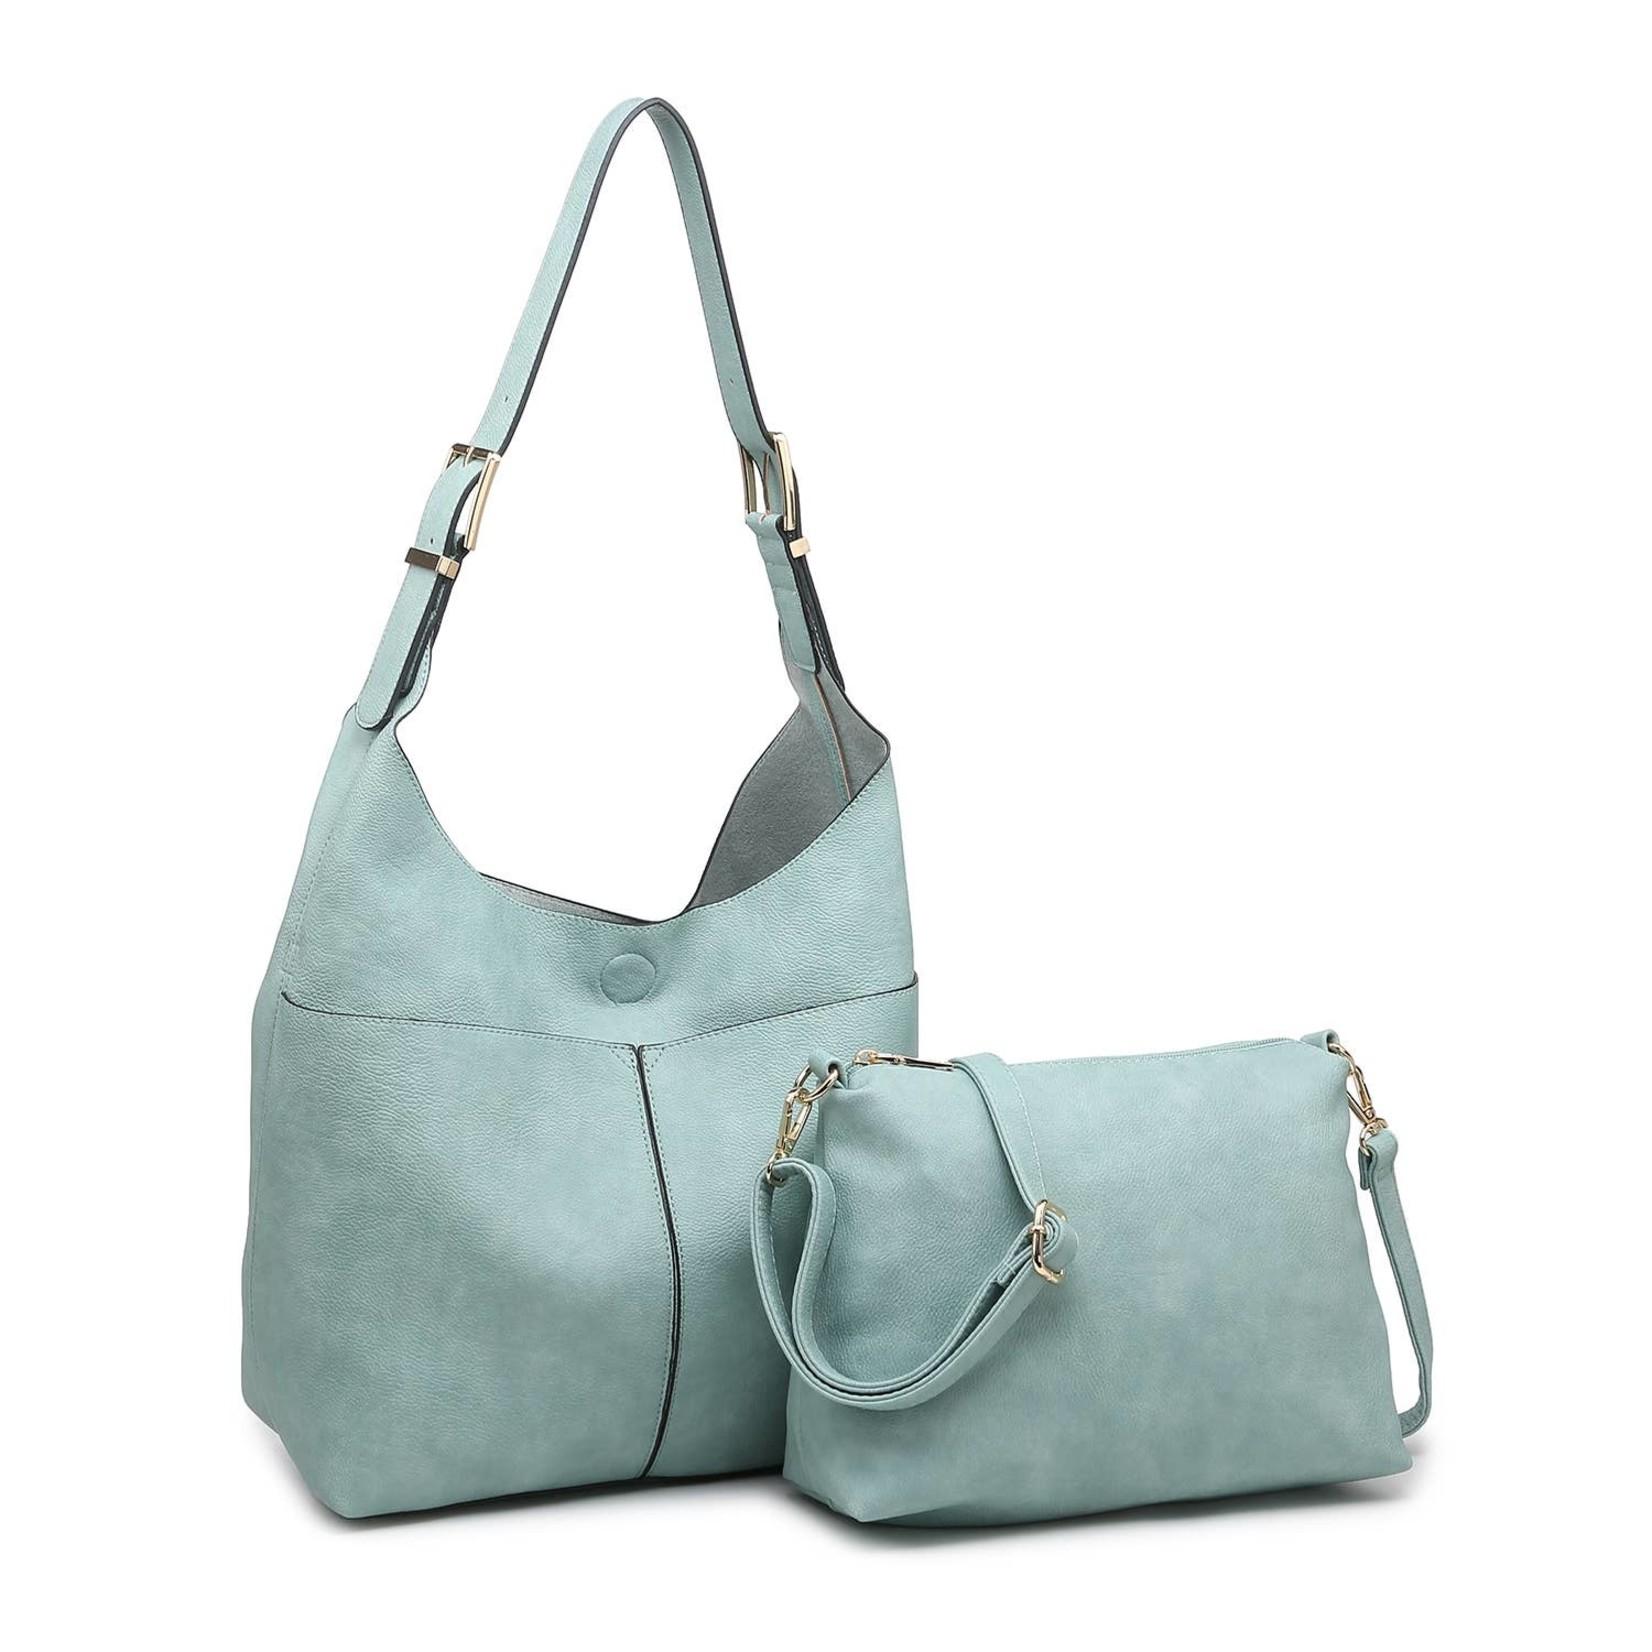 Ida Slouchy Hobo Bag w/Adjustable Strap in Lt Teal